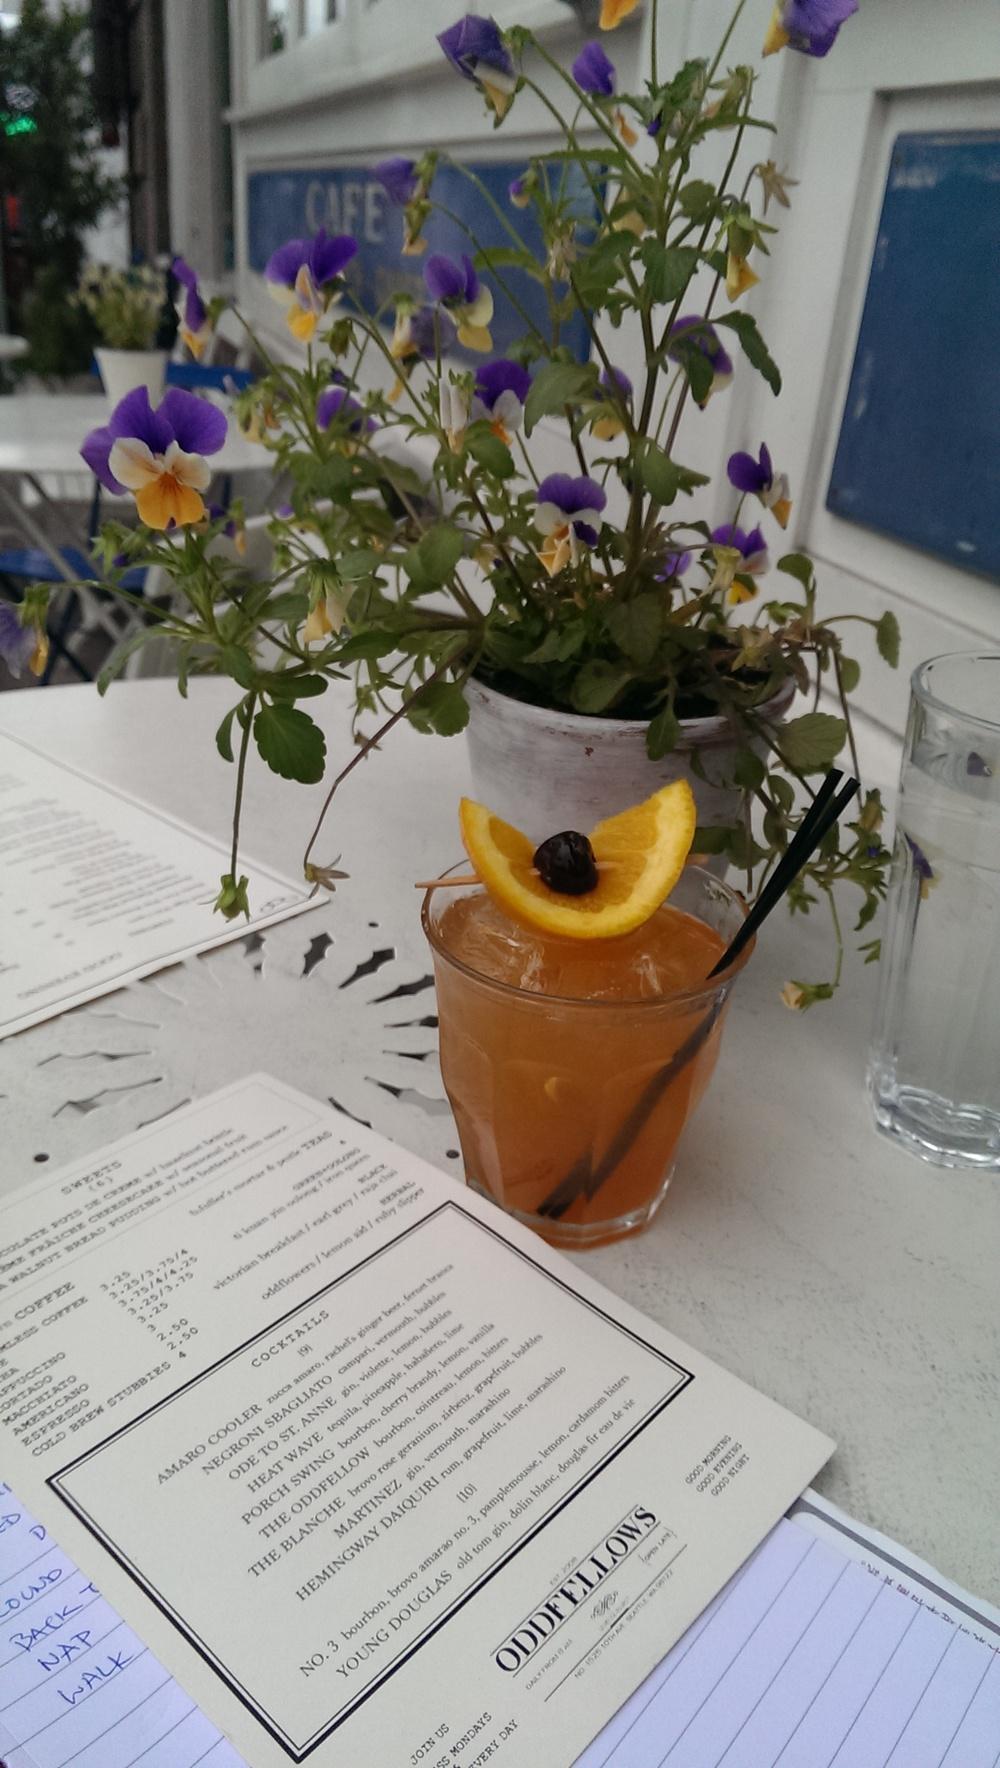 16 - Oddfellow Restaurant house cocktail